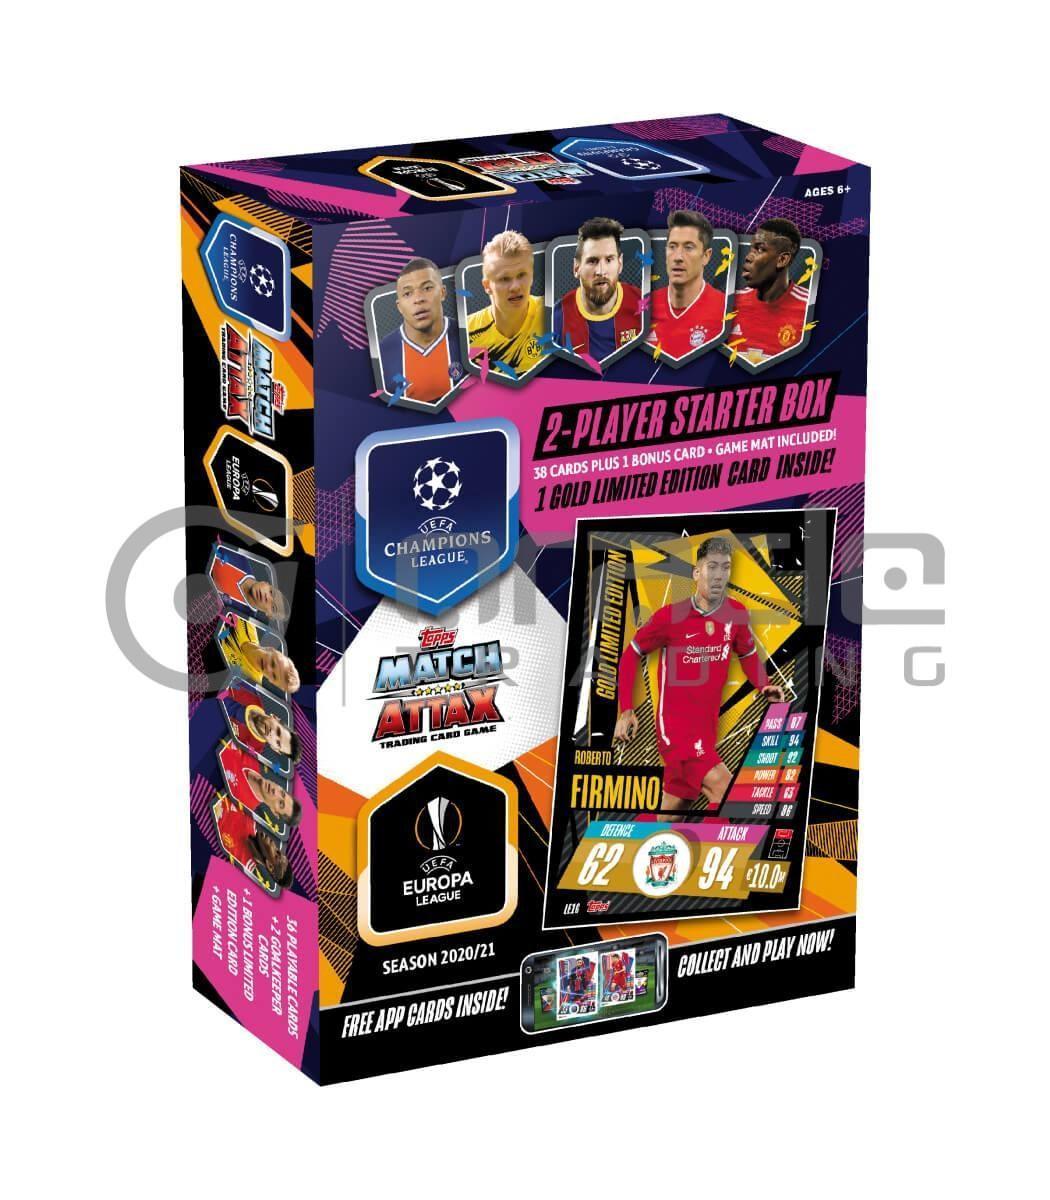 2020-21 Topps Match-Attax Champions League Cards - Starter Box